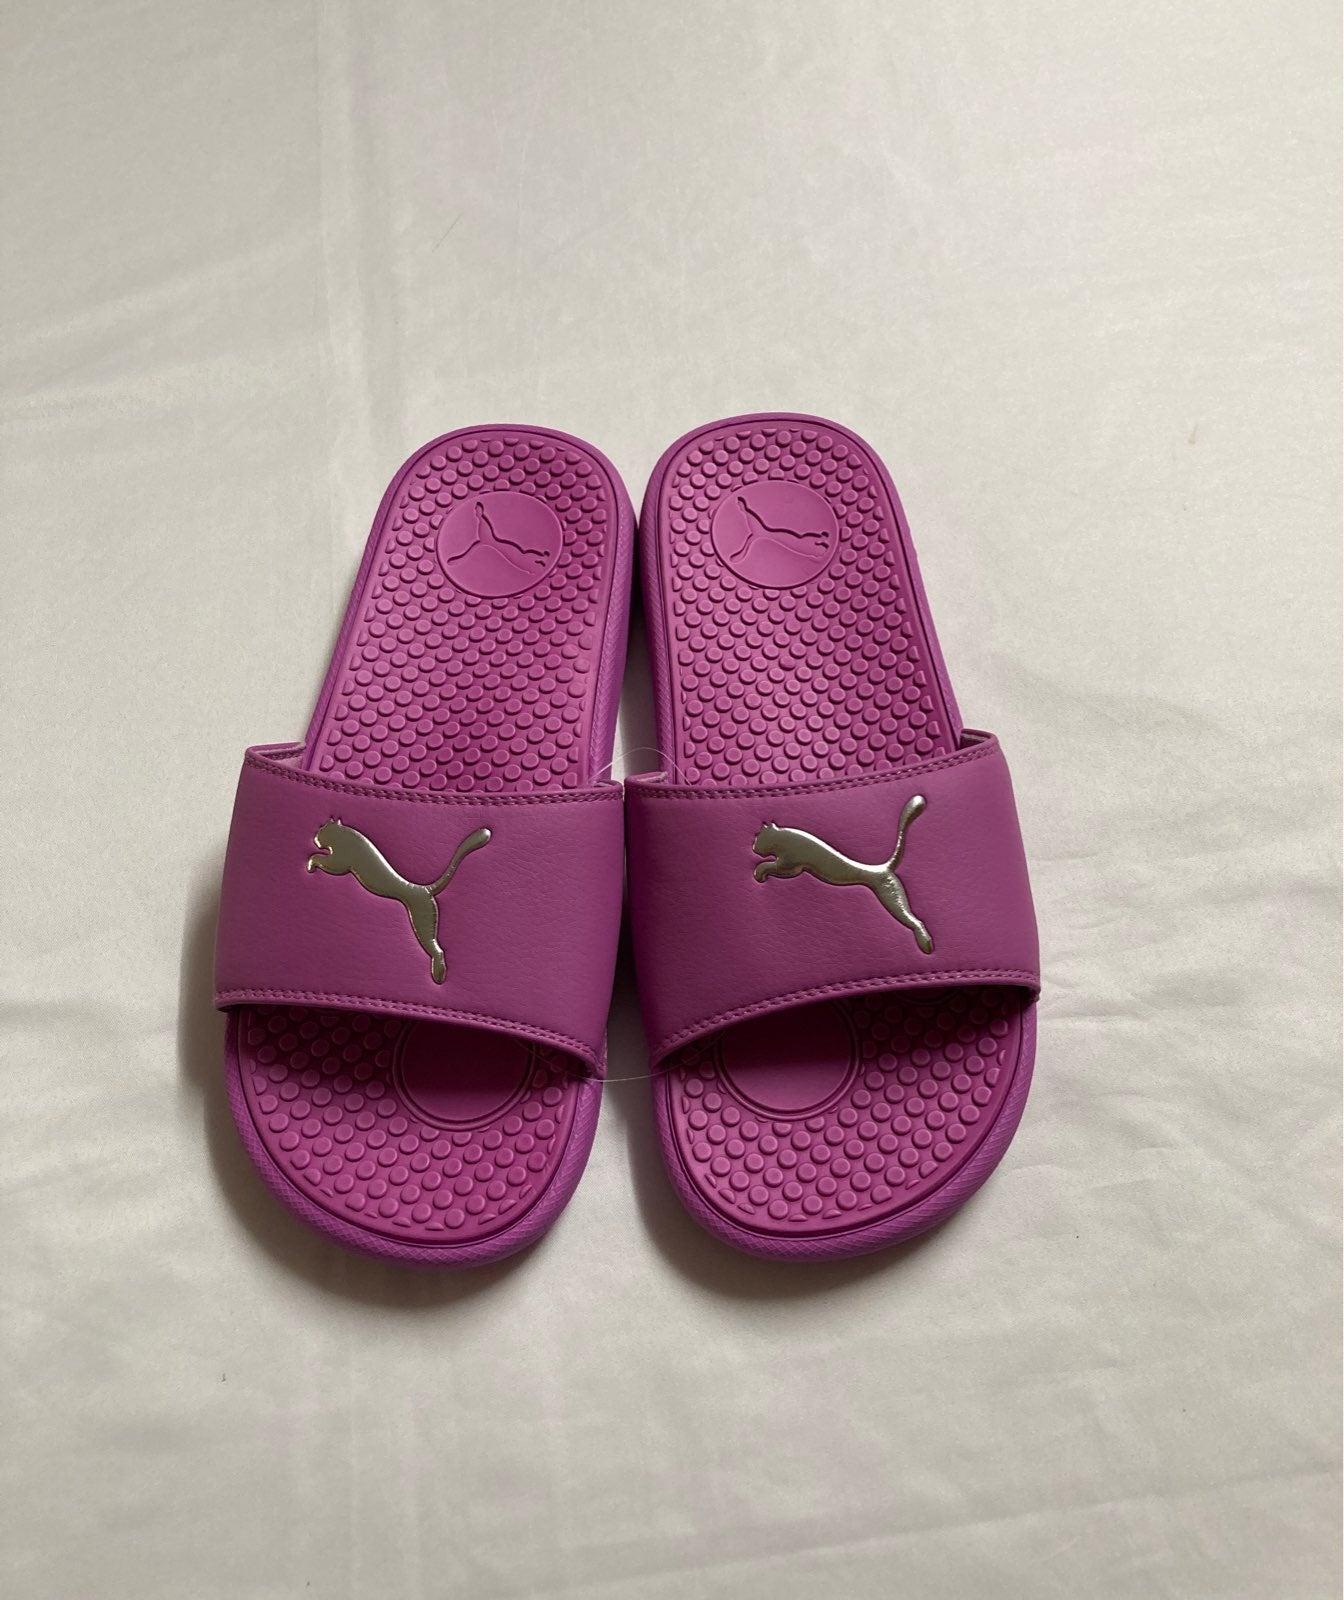 PUMA Slipper Slippers   Mercari